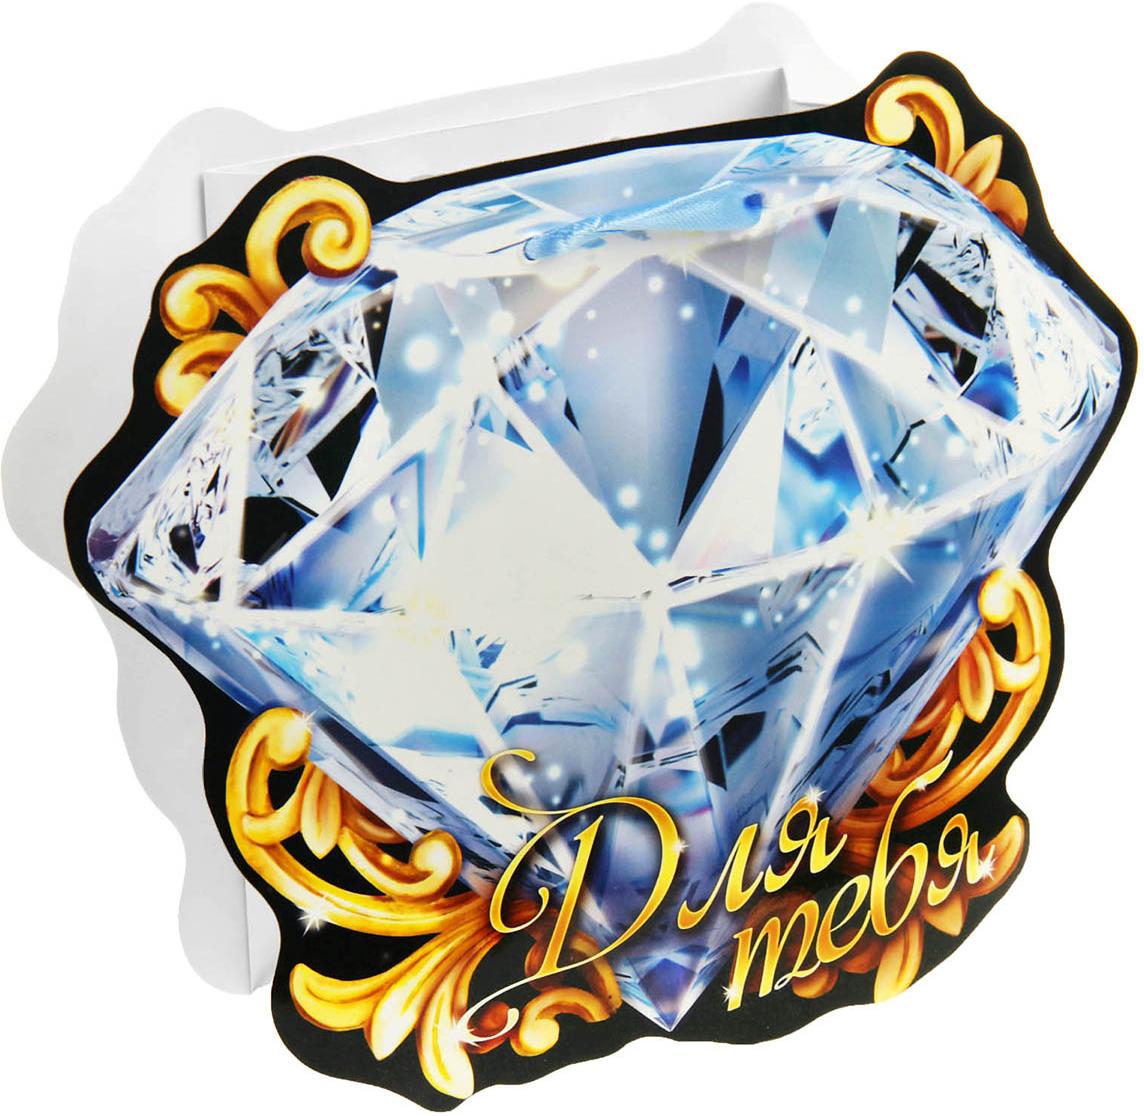 Открытка о бриллианте